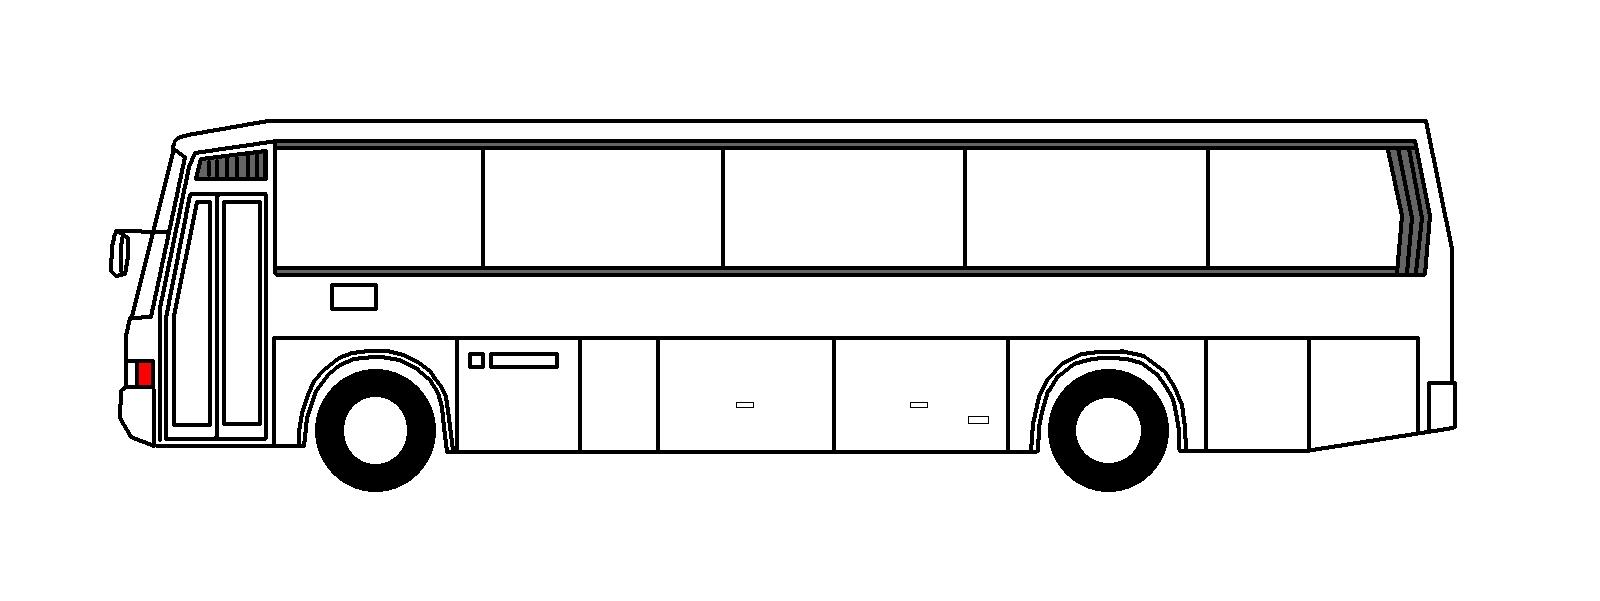 Bus clipart side view. Unique black and white